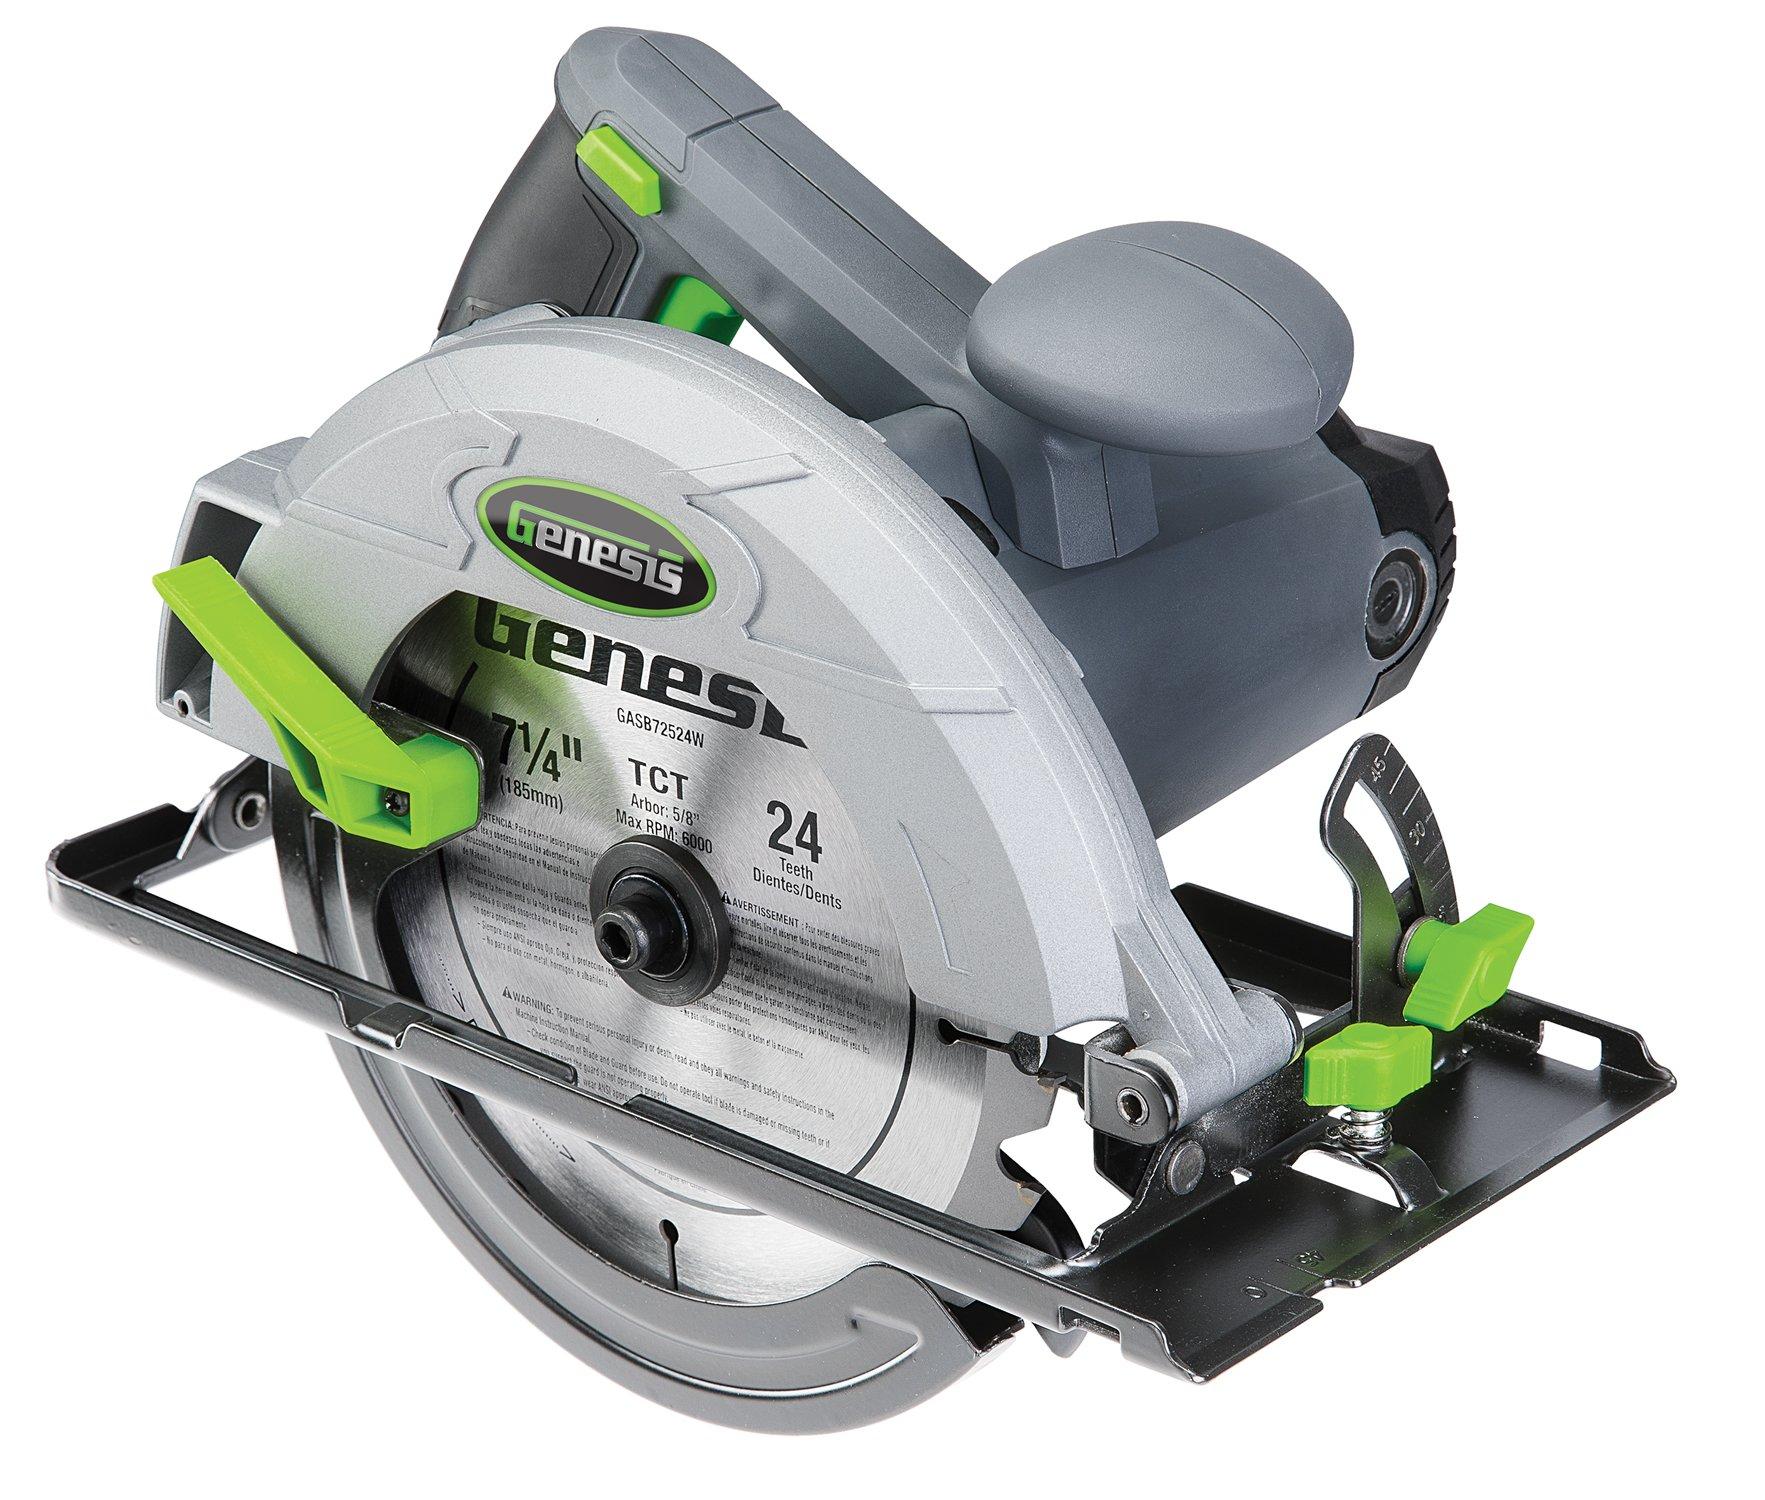 Genesis Gcs130 Circular Saw With 13 Amp Motor, 7-1/4'' Blade